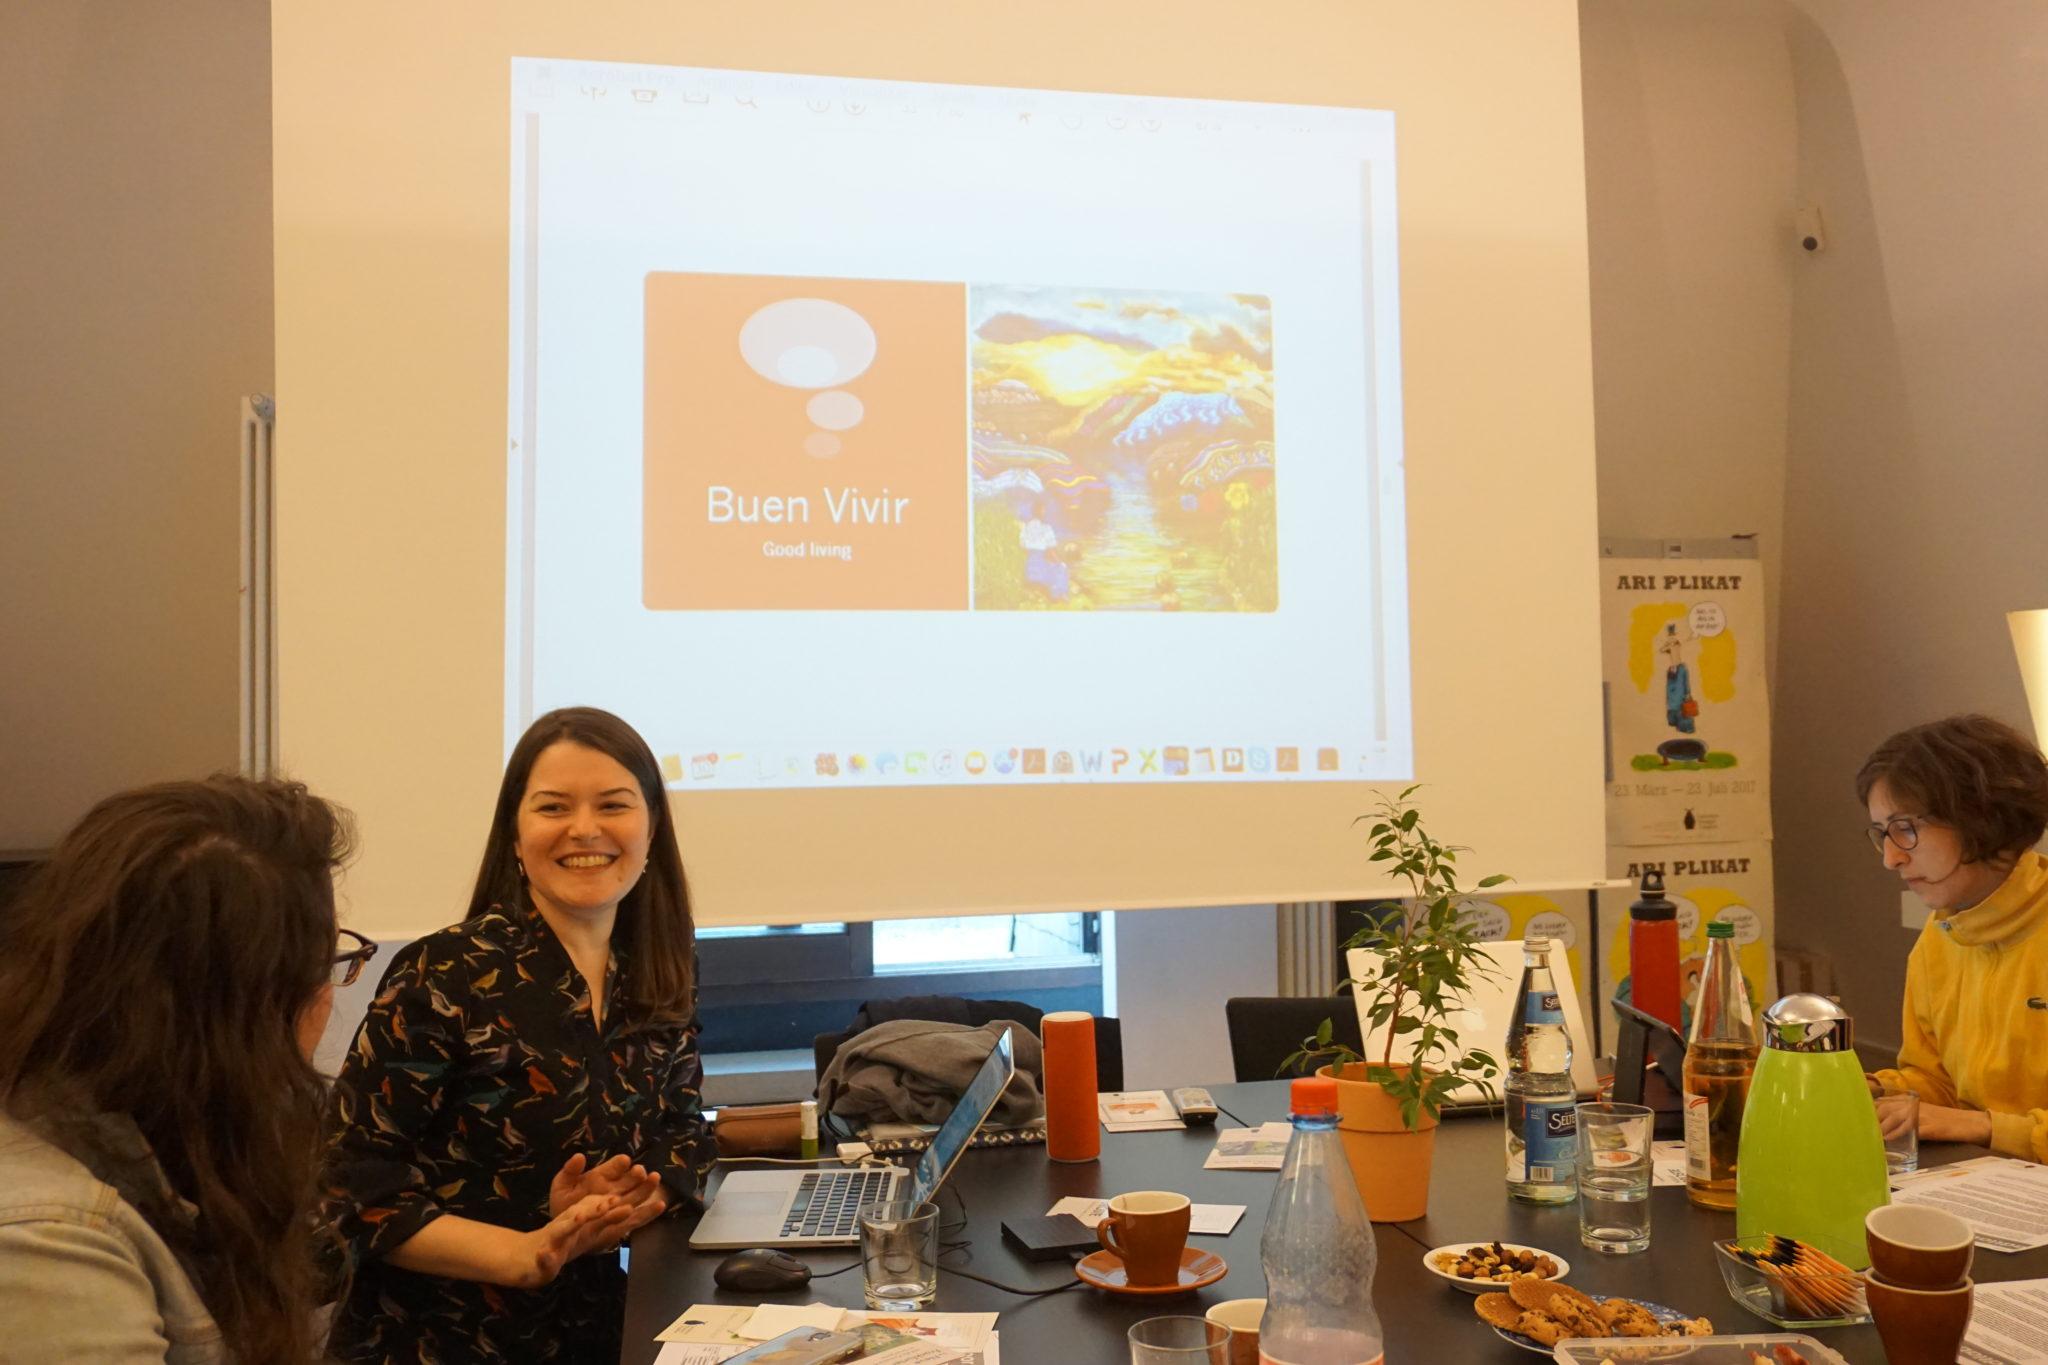 Third workshop with Juliana de Siqueira, March 2017